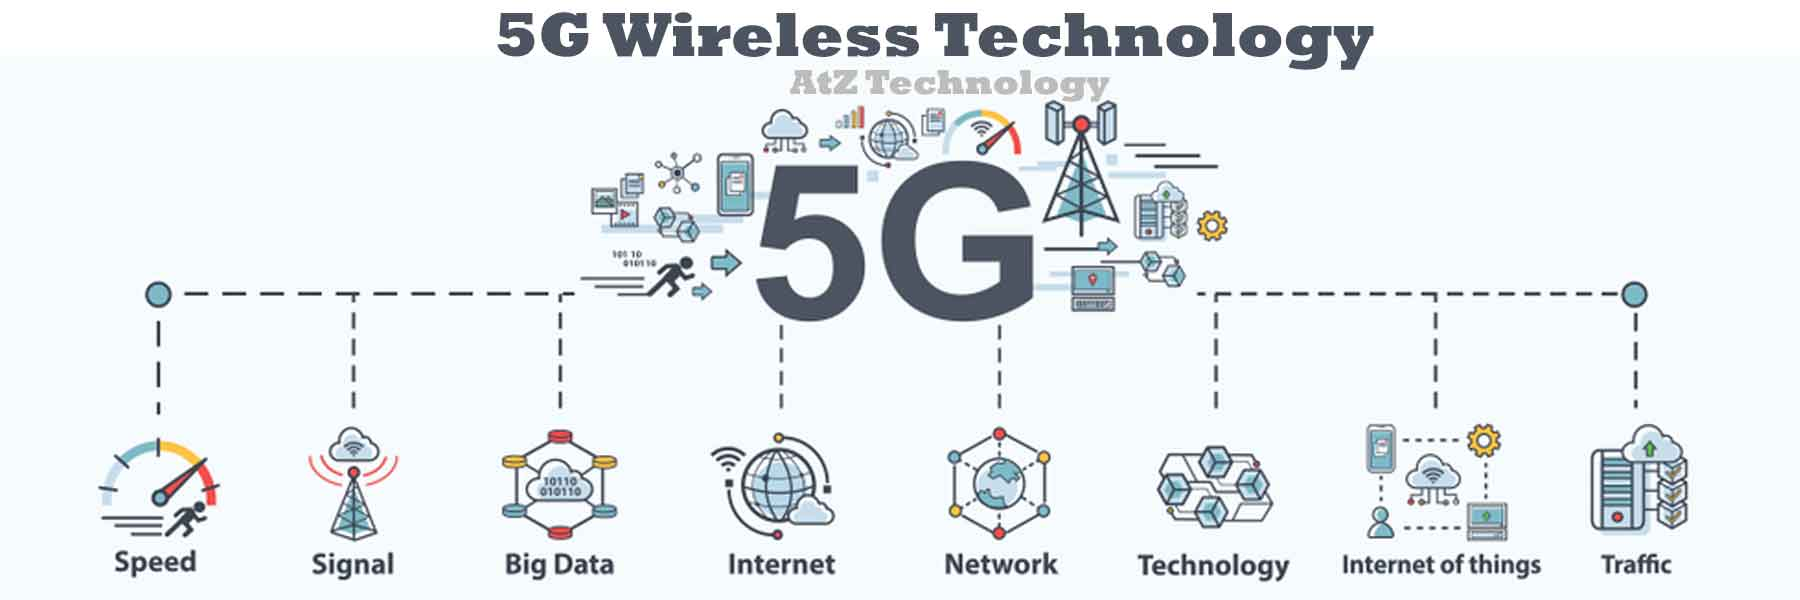 5g Wireless Technology: Definition, Advantage & Reasons 2021